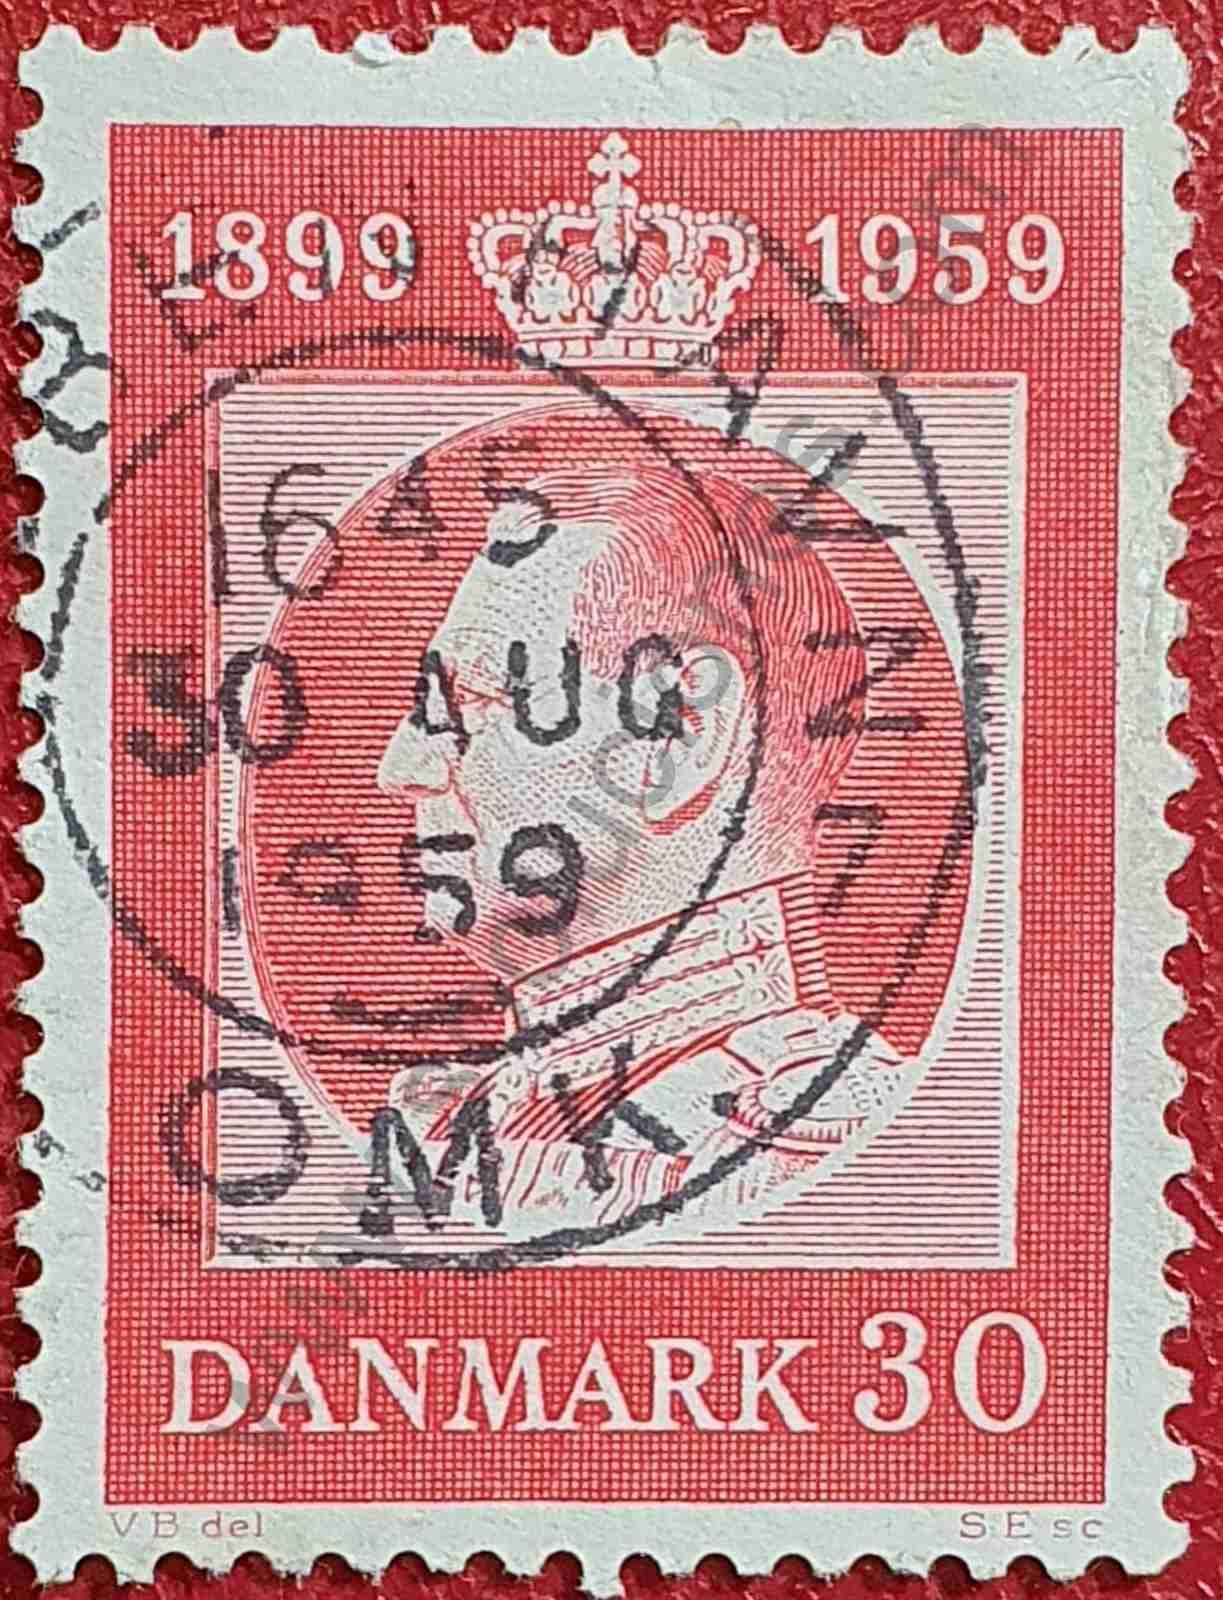 Federico IX - 30 coronas - Sello Dinamarca 1959